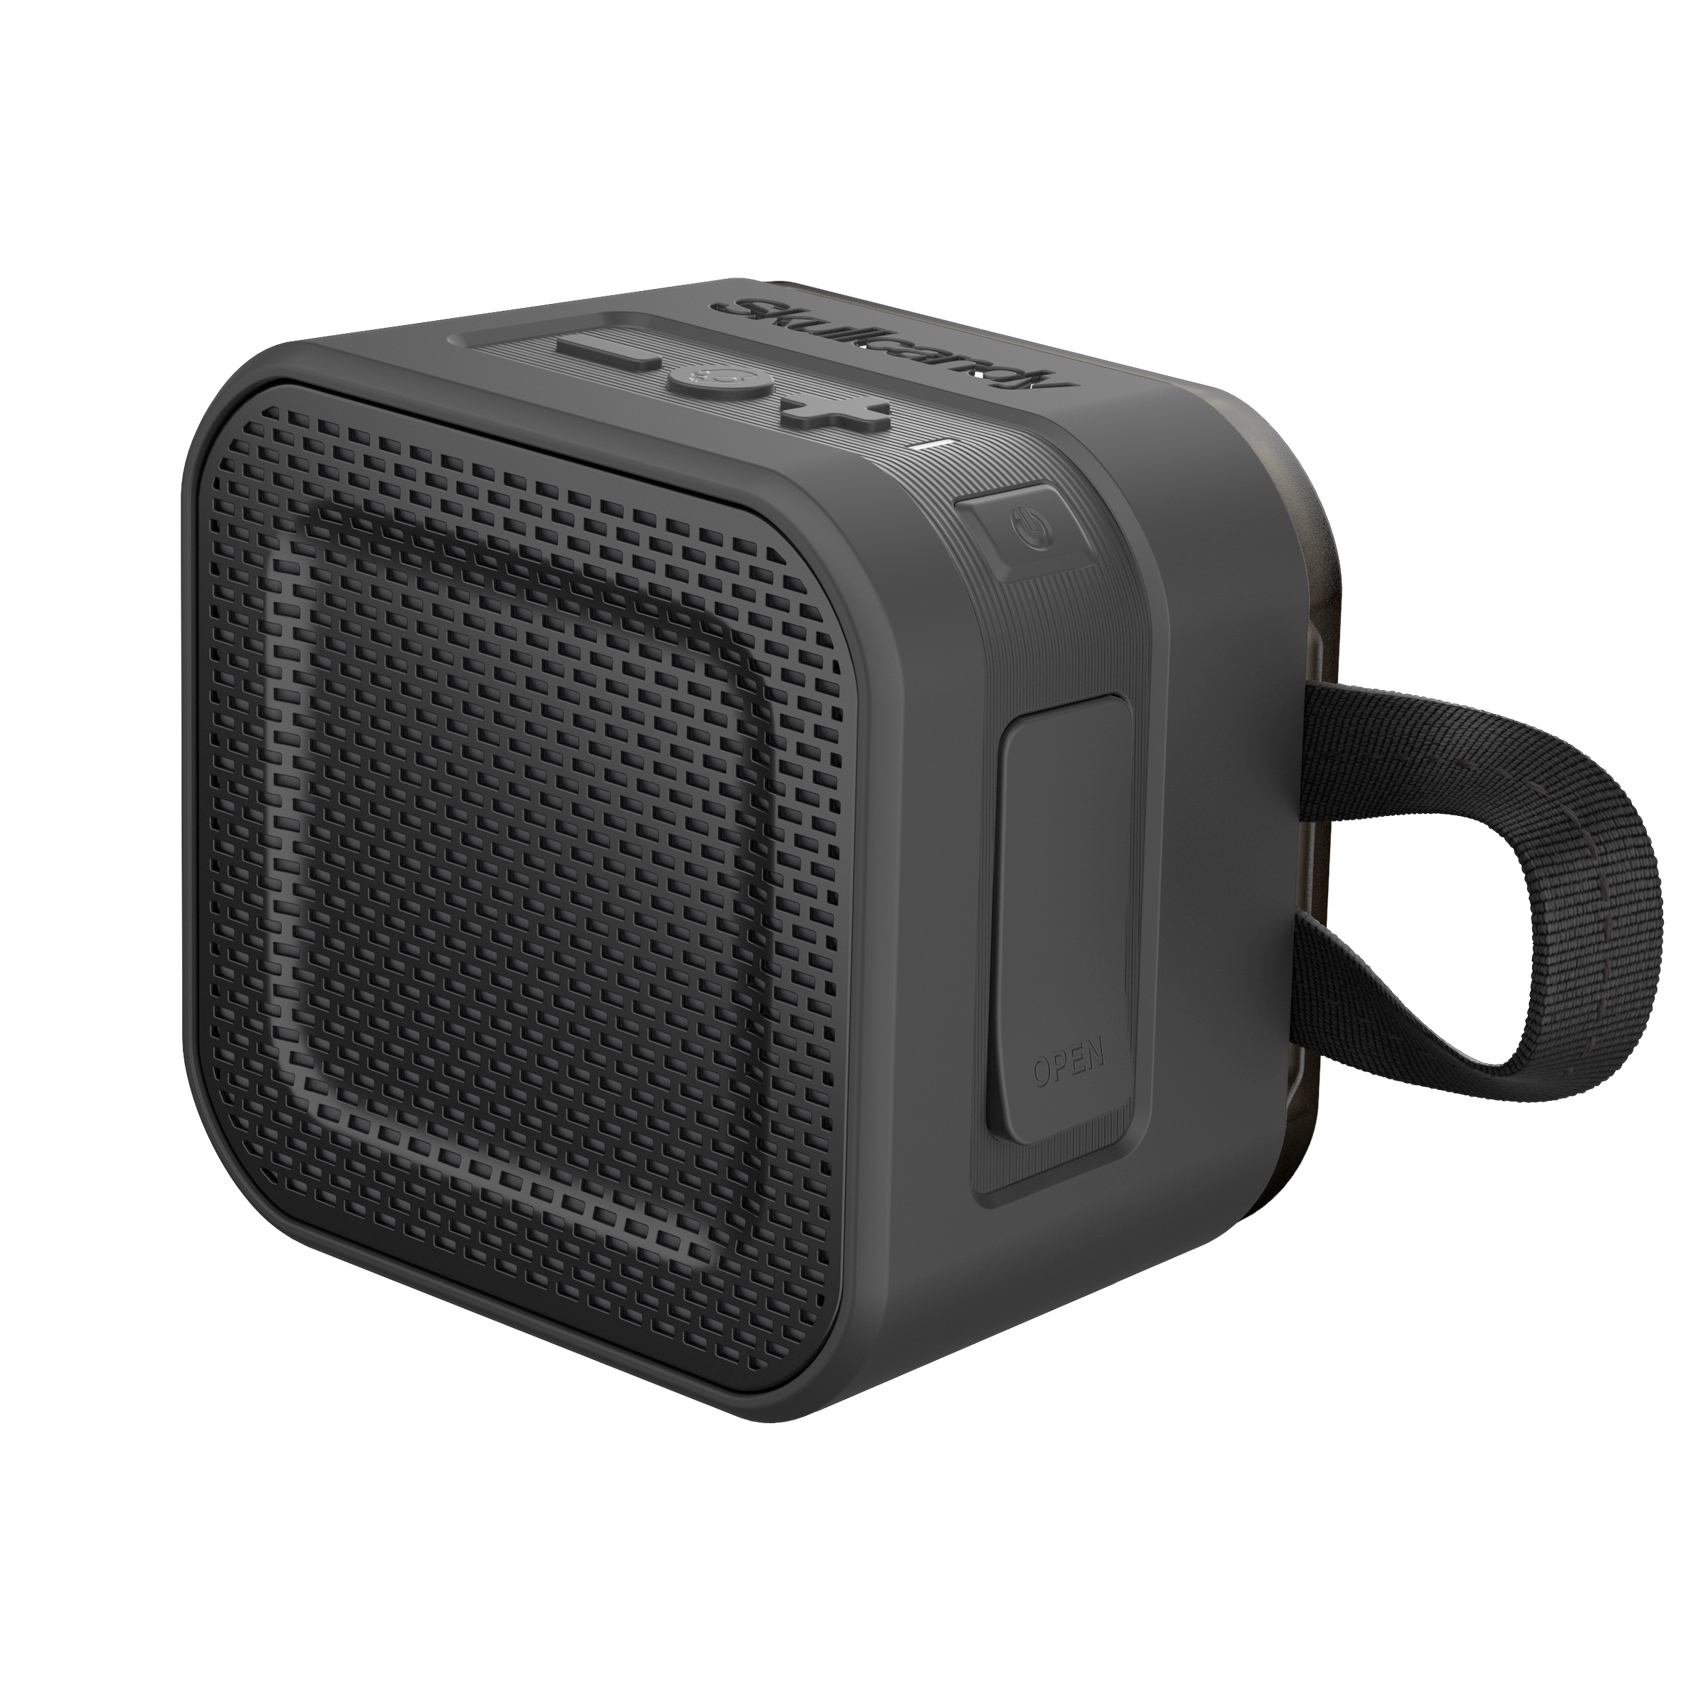 Altavoz-portatil-Bluetooth-Skullcandy-Barricada-Mini-agua-y-el-impacto-resistir